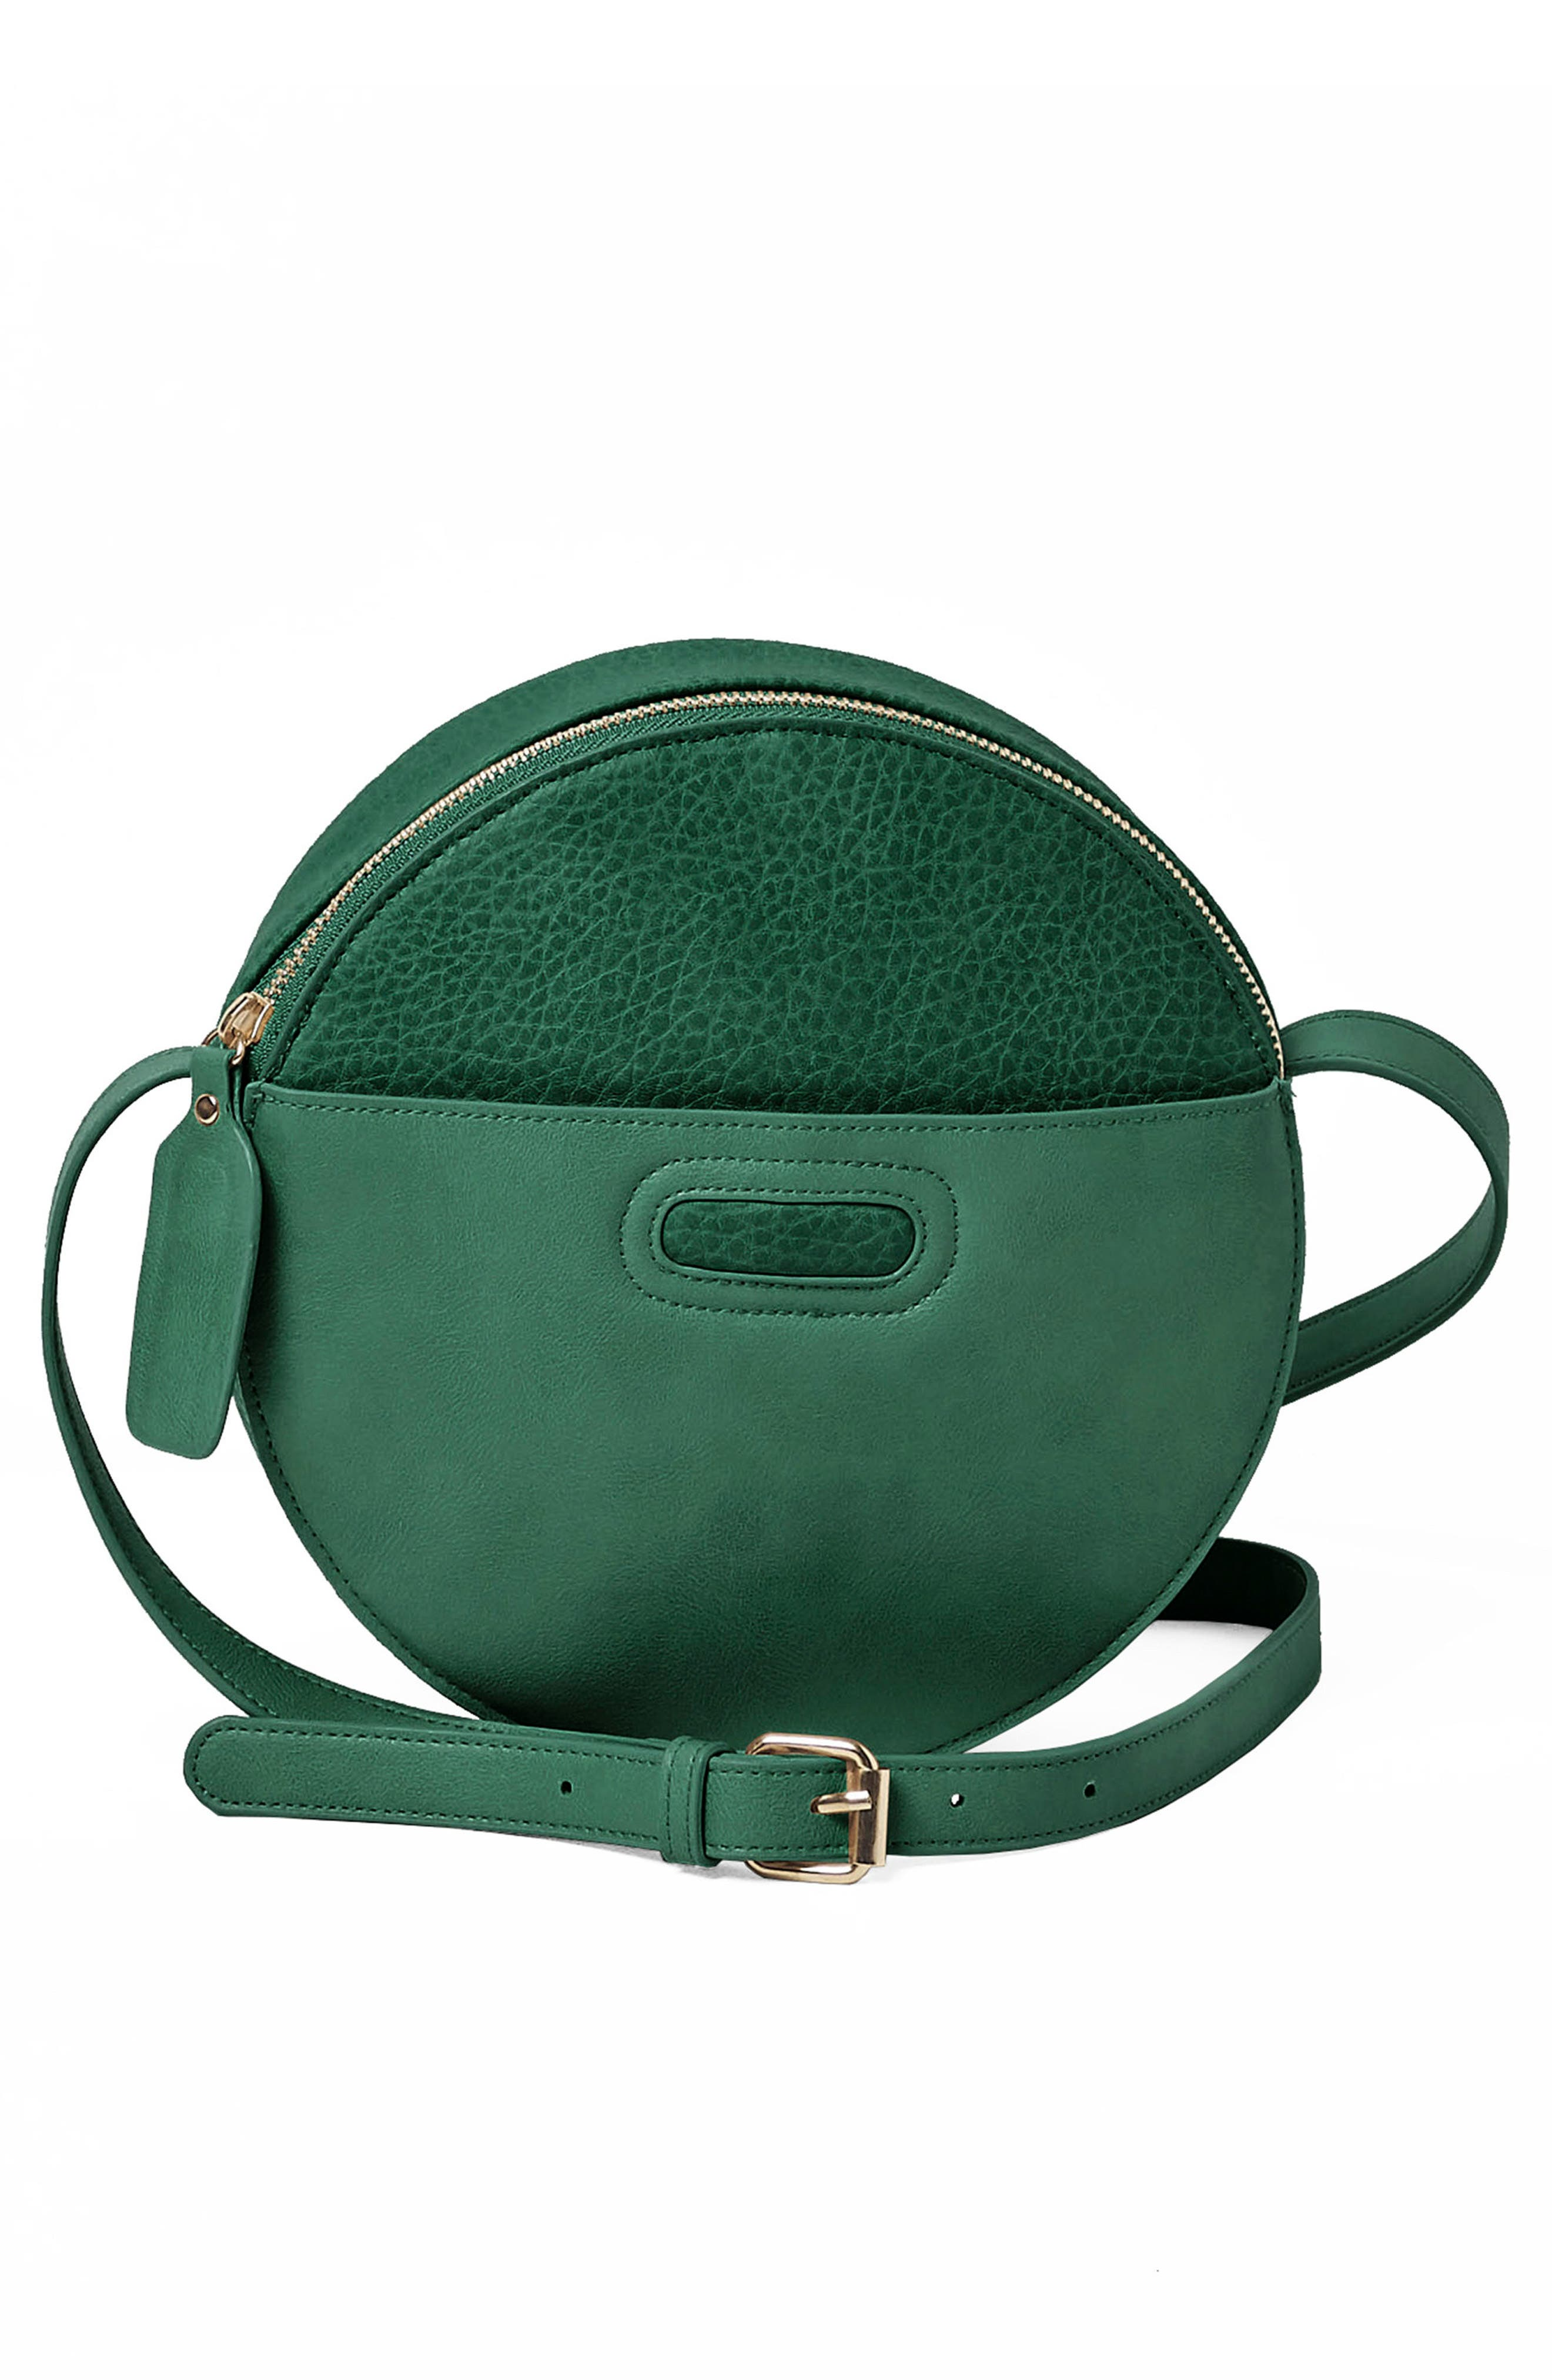 Carousel Vegan Leather Crossbody Bag,                             Main thumbnail 1, color,                             Emerald